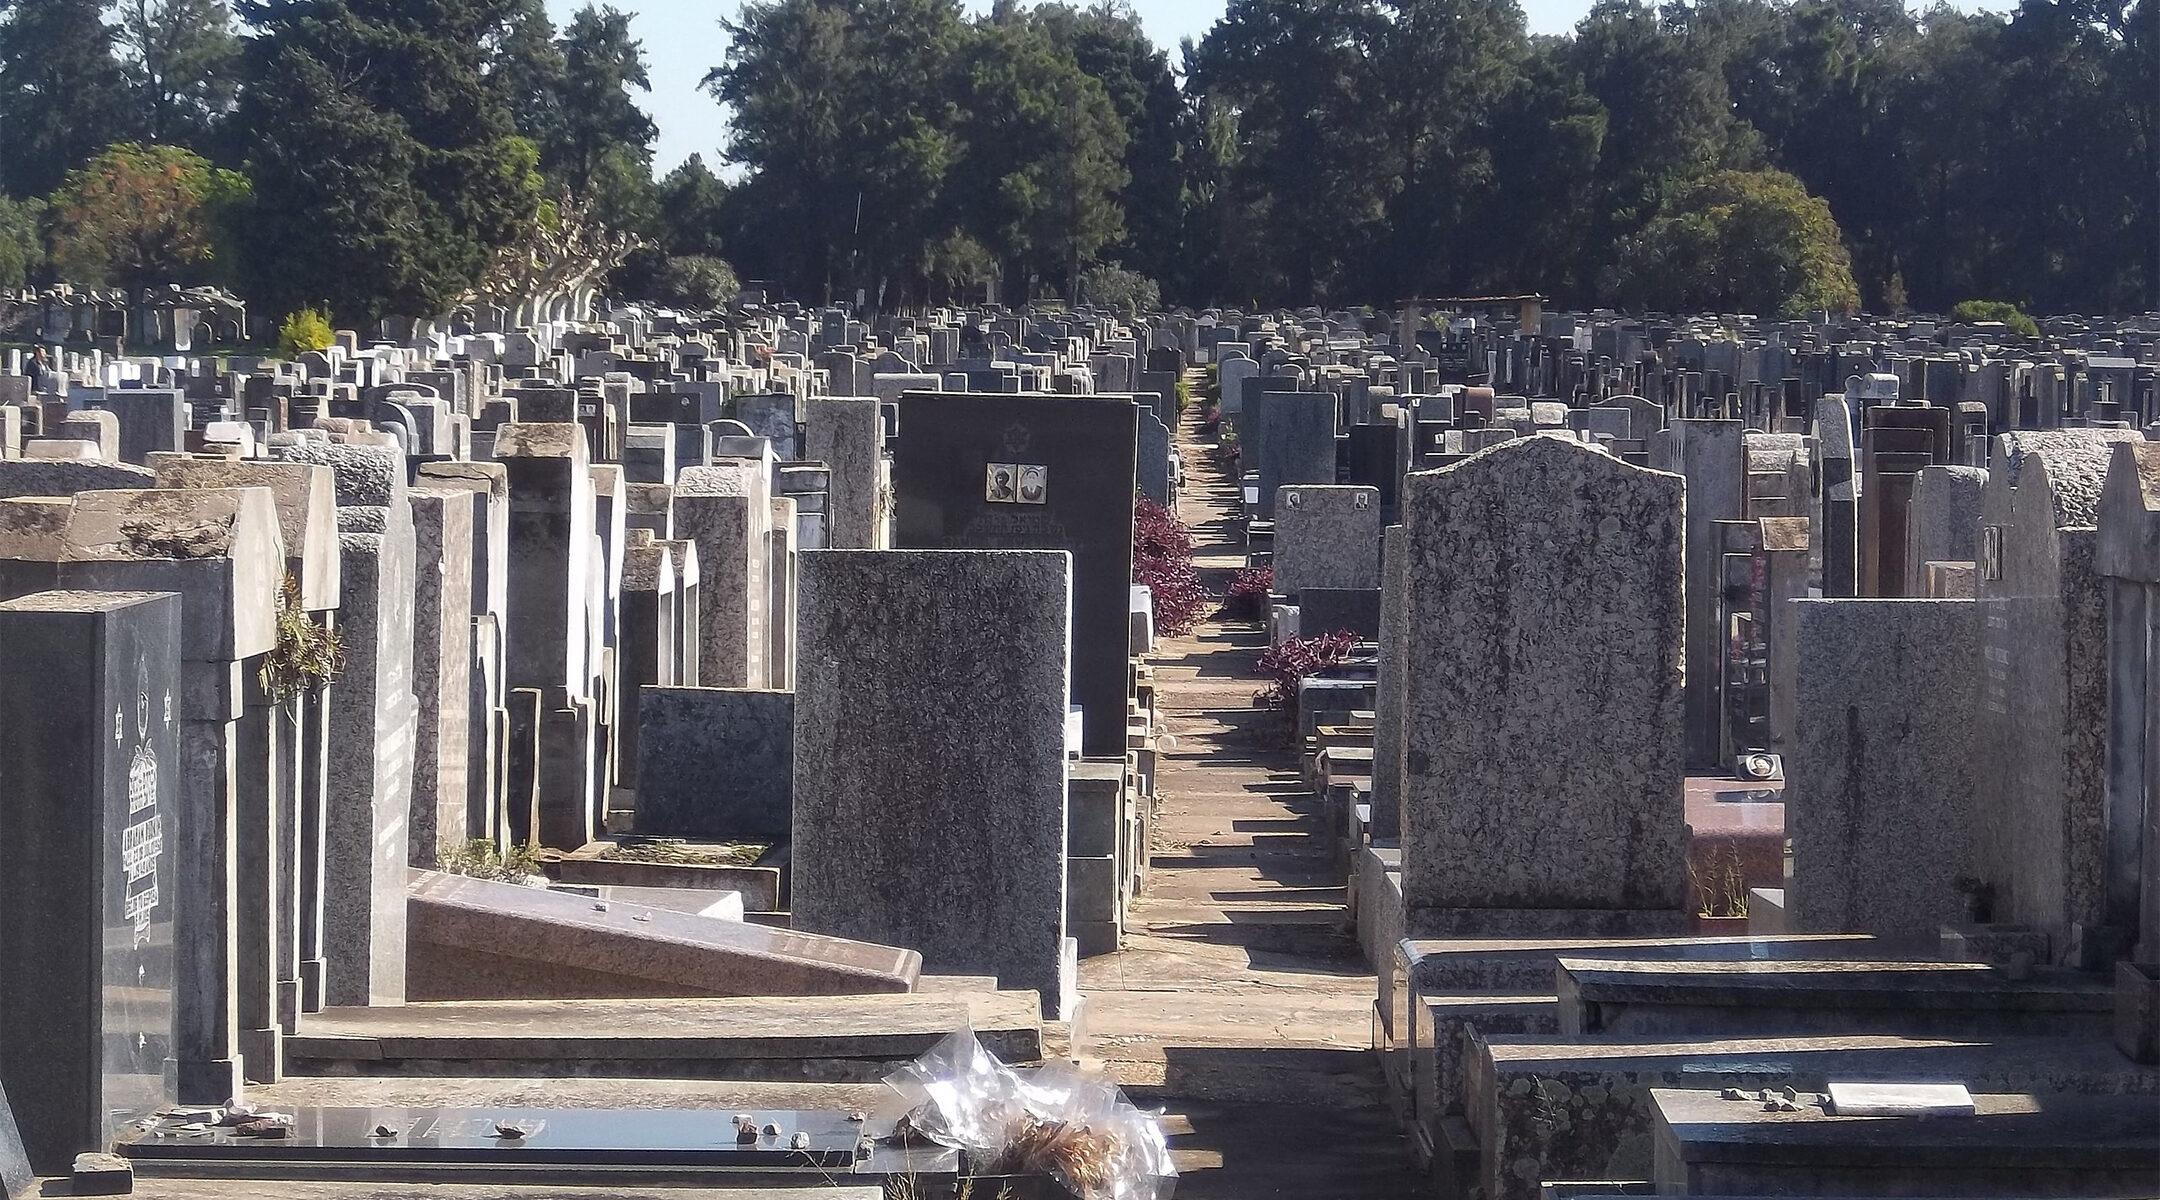 The Jewish cemetery of La Tablada in Buenos Aires, Argentina, pictured in 2013. (Wikimedia Commons/Dario Alpern)